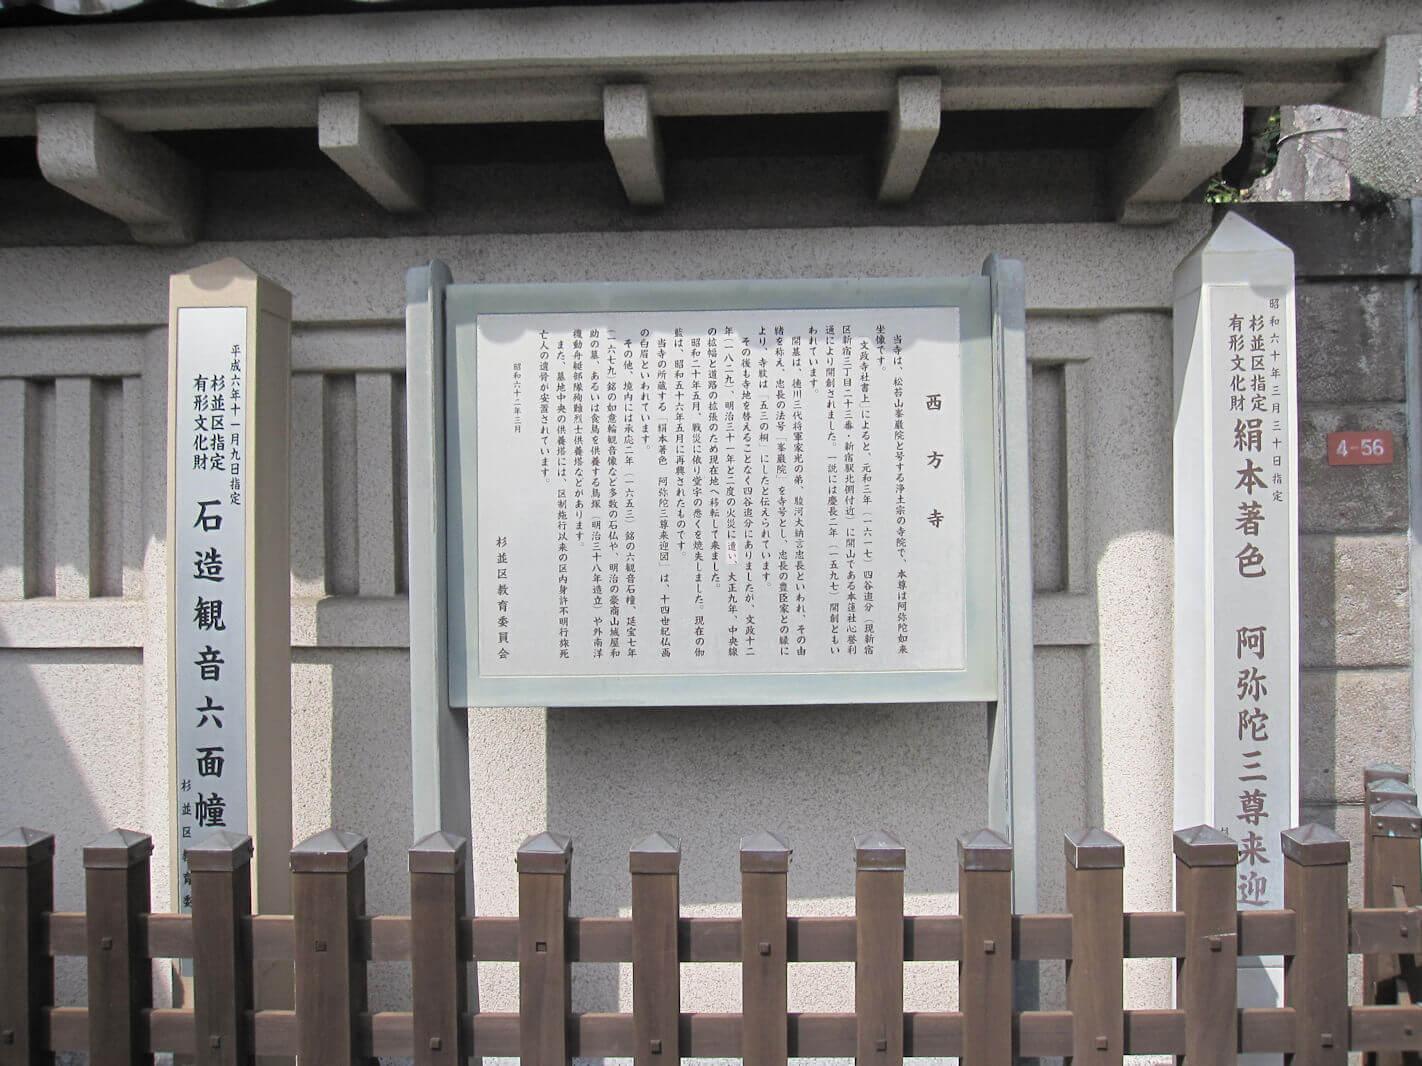 西方寺の入口(看板正面)